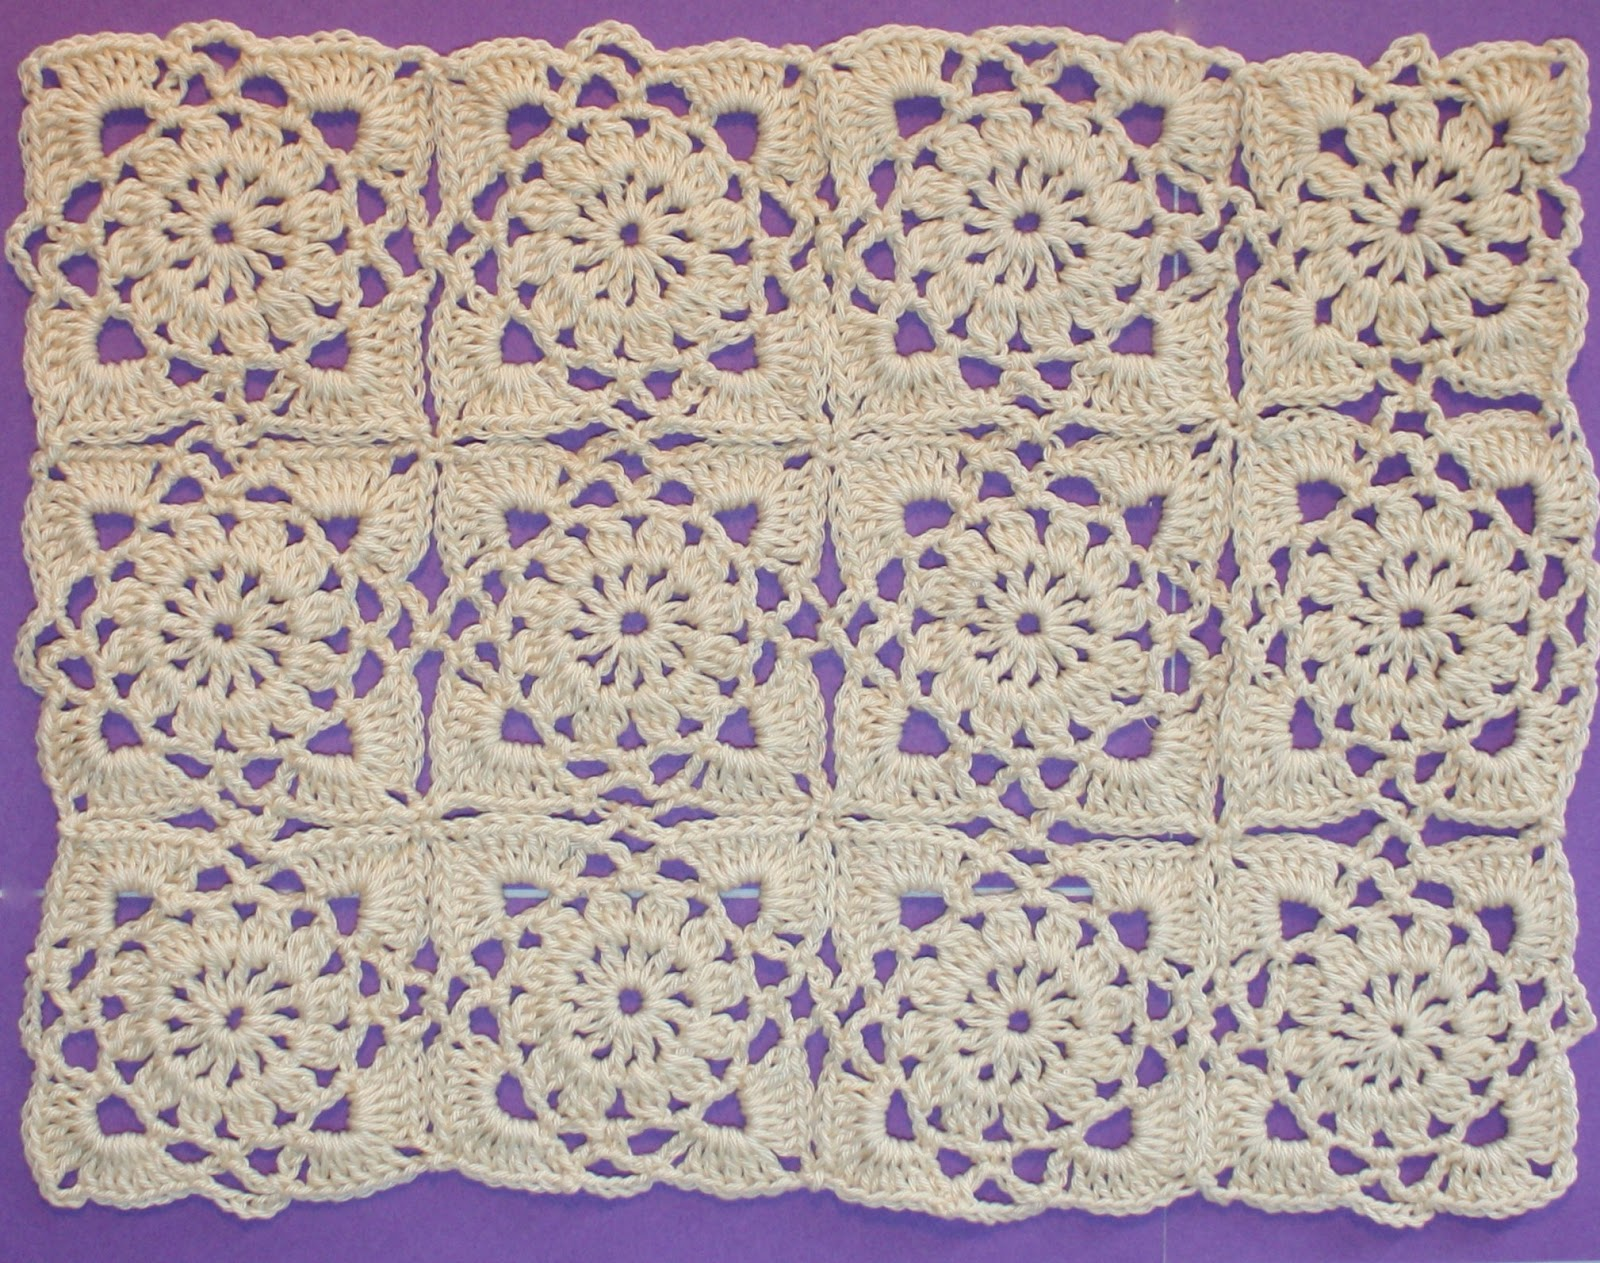 Crochet Square Motif Diagram Pattern Ford 6 0 Alternator Wiring Beyond The 118 Bag